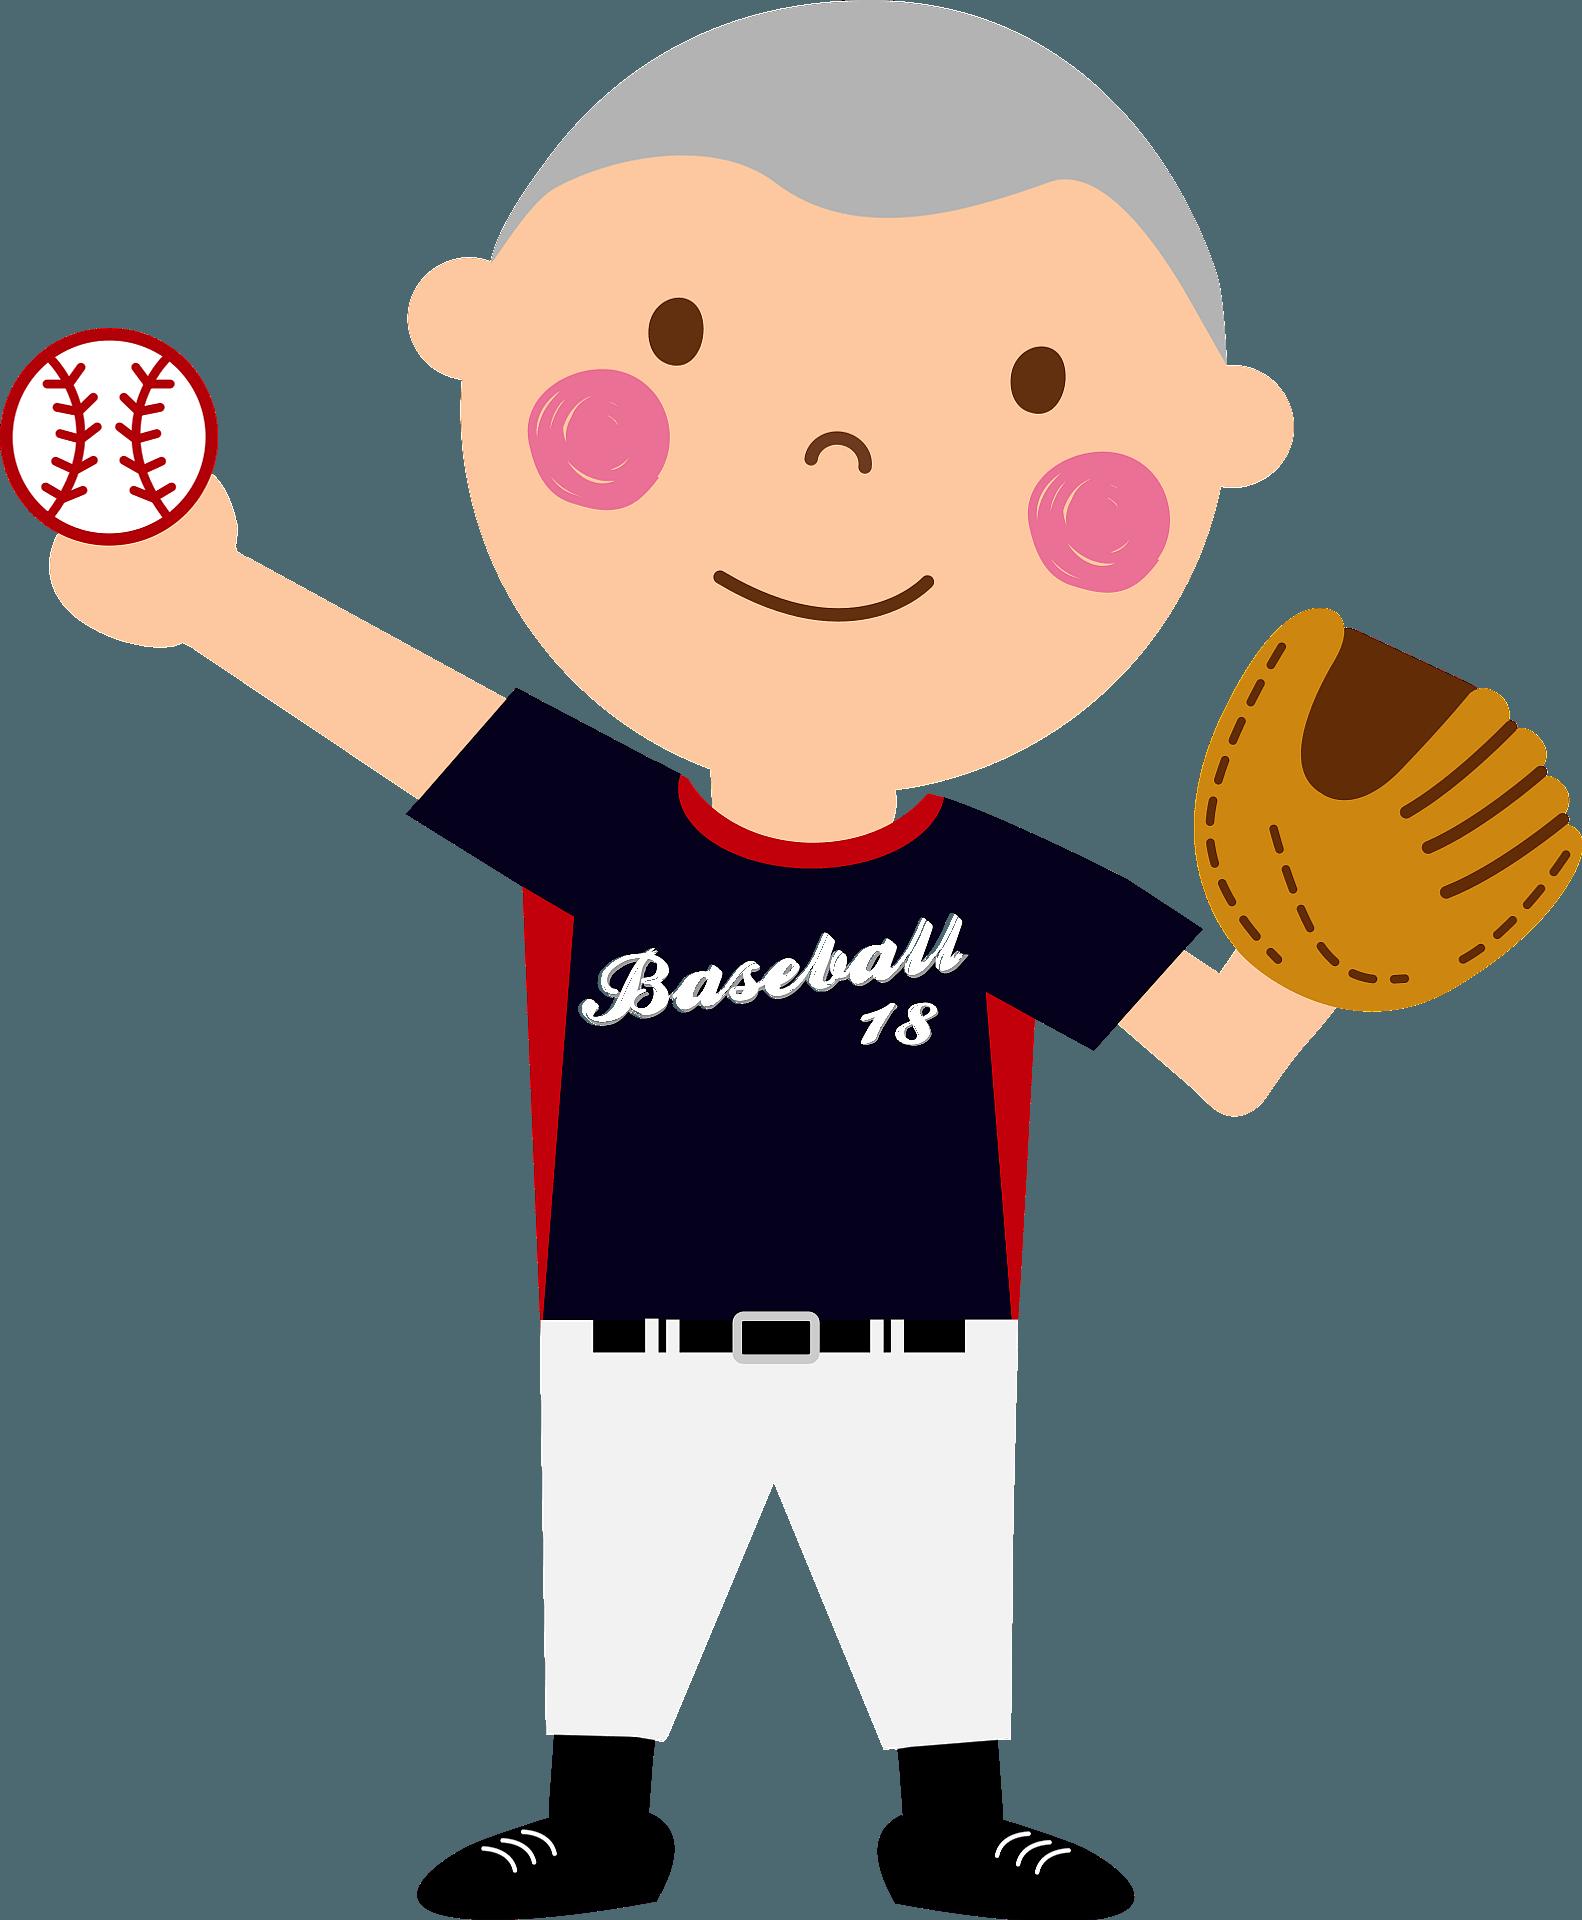 Baseball Clipart Scrapbook - Beisbol Niños Png , Free Transparent Clipart -  ClipartKey